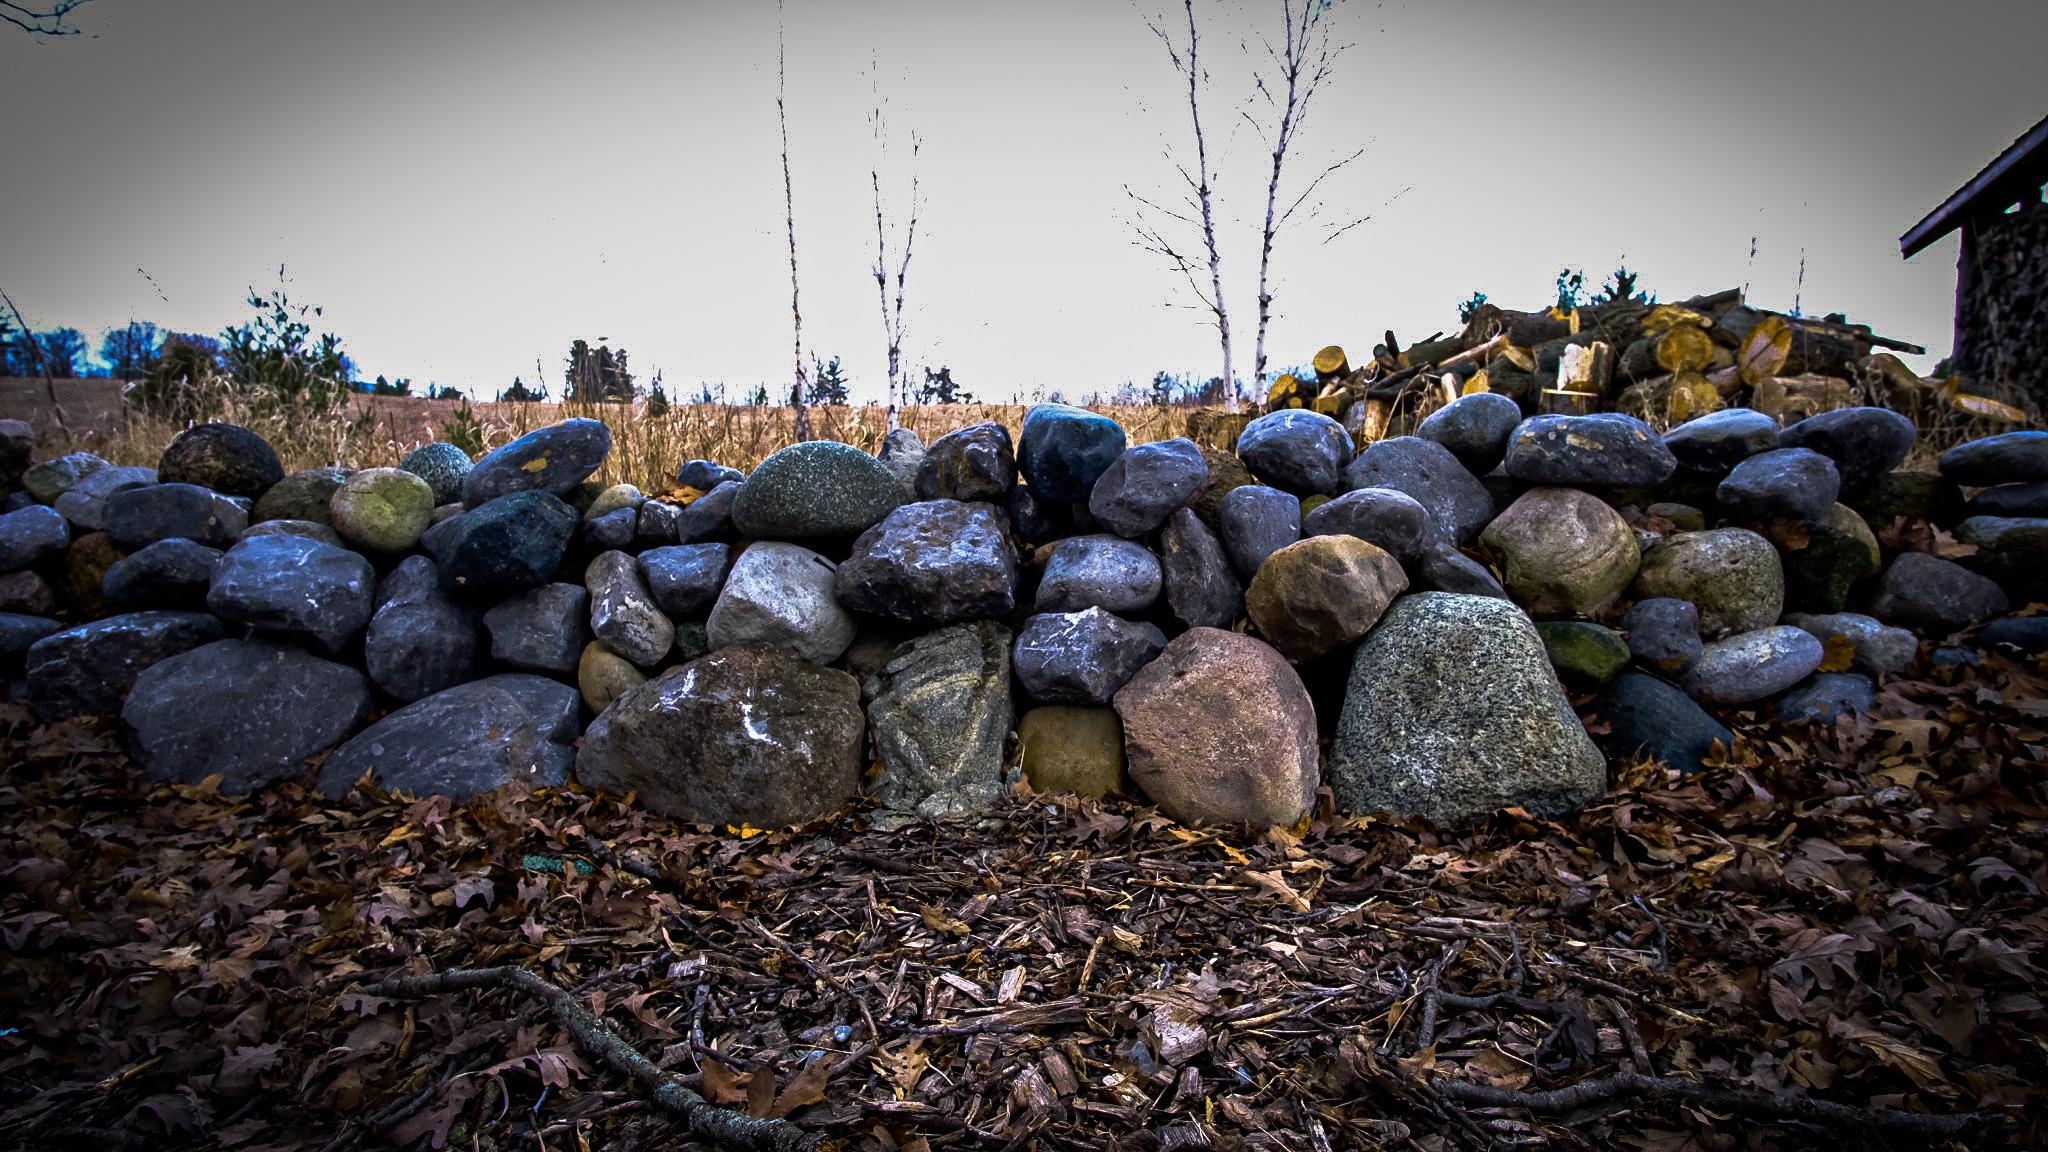 Rock Wall at the Farm